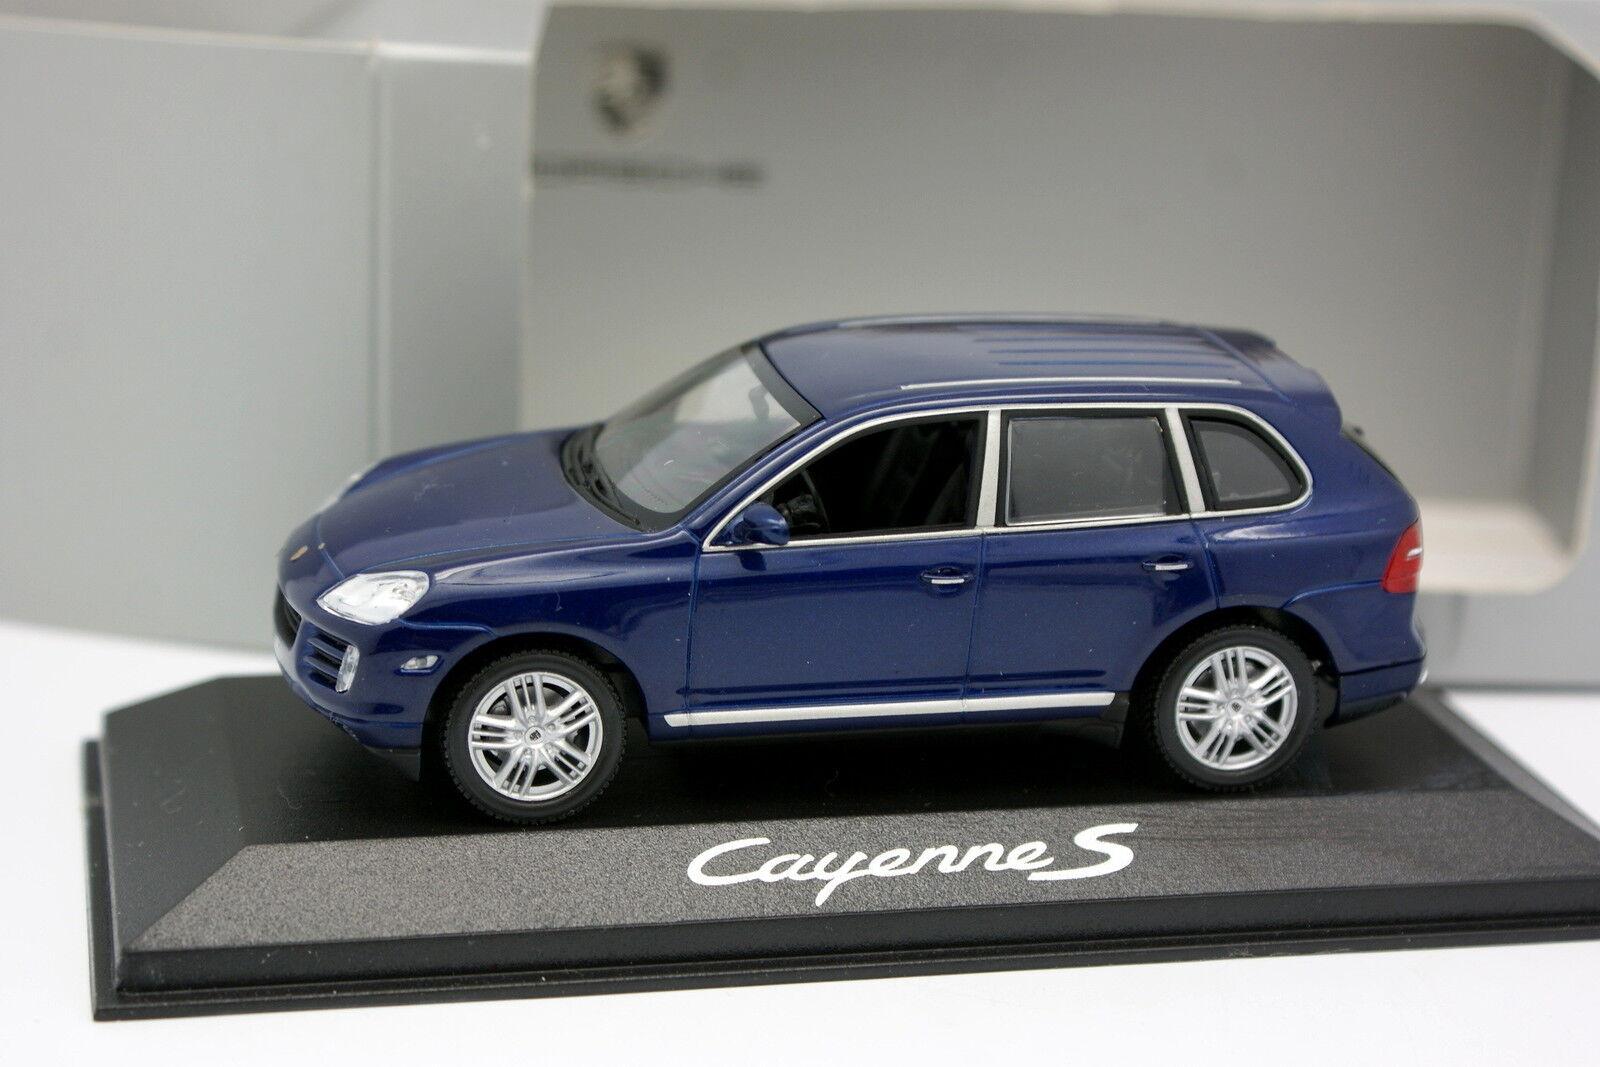 Minichamps 1 43 - Porsche Cayenne S Bleue